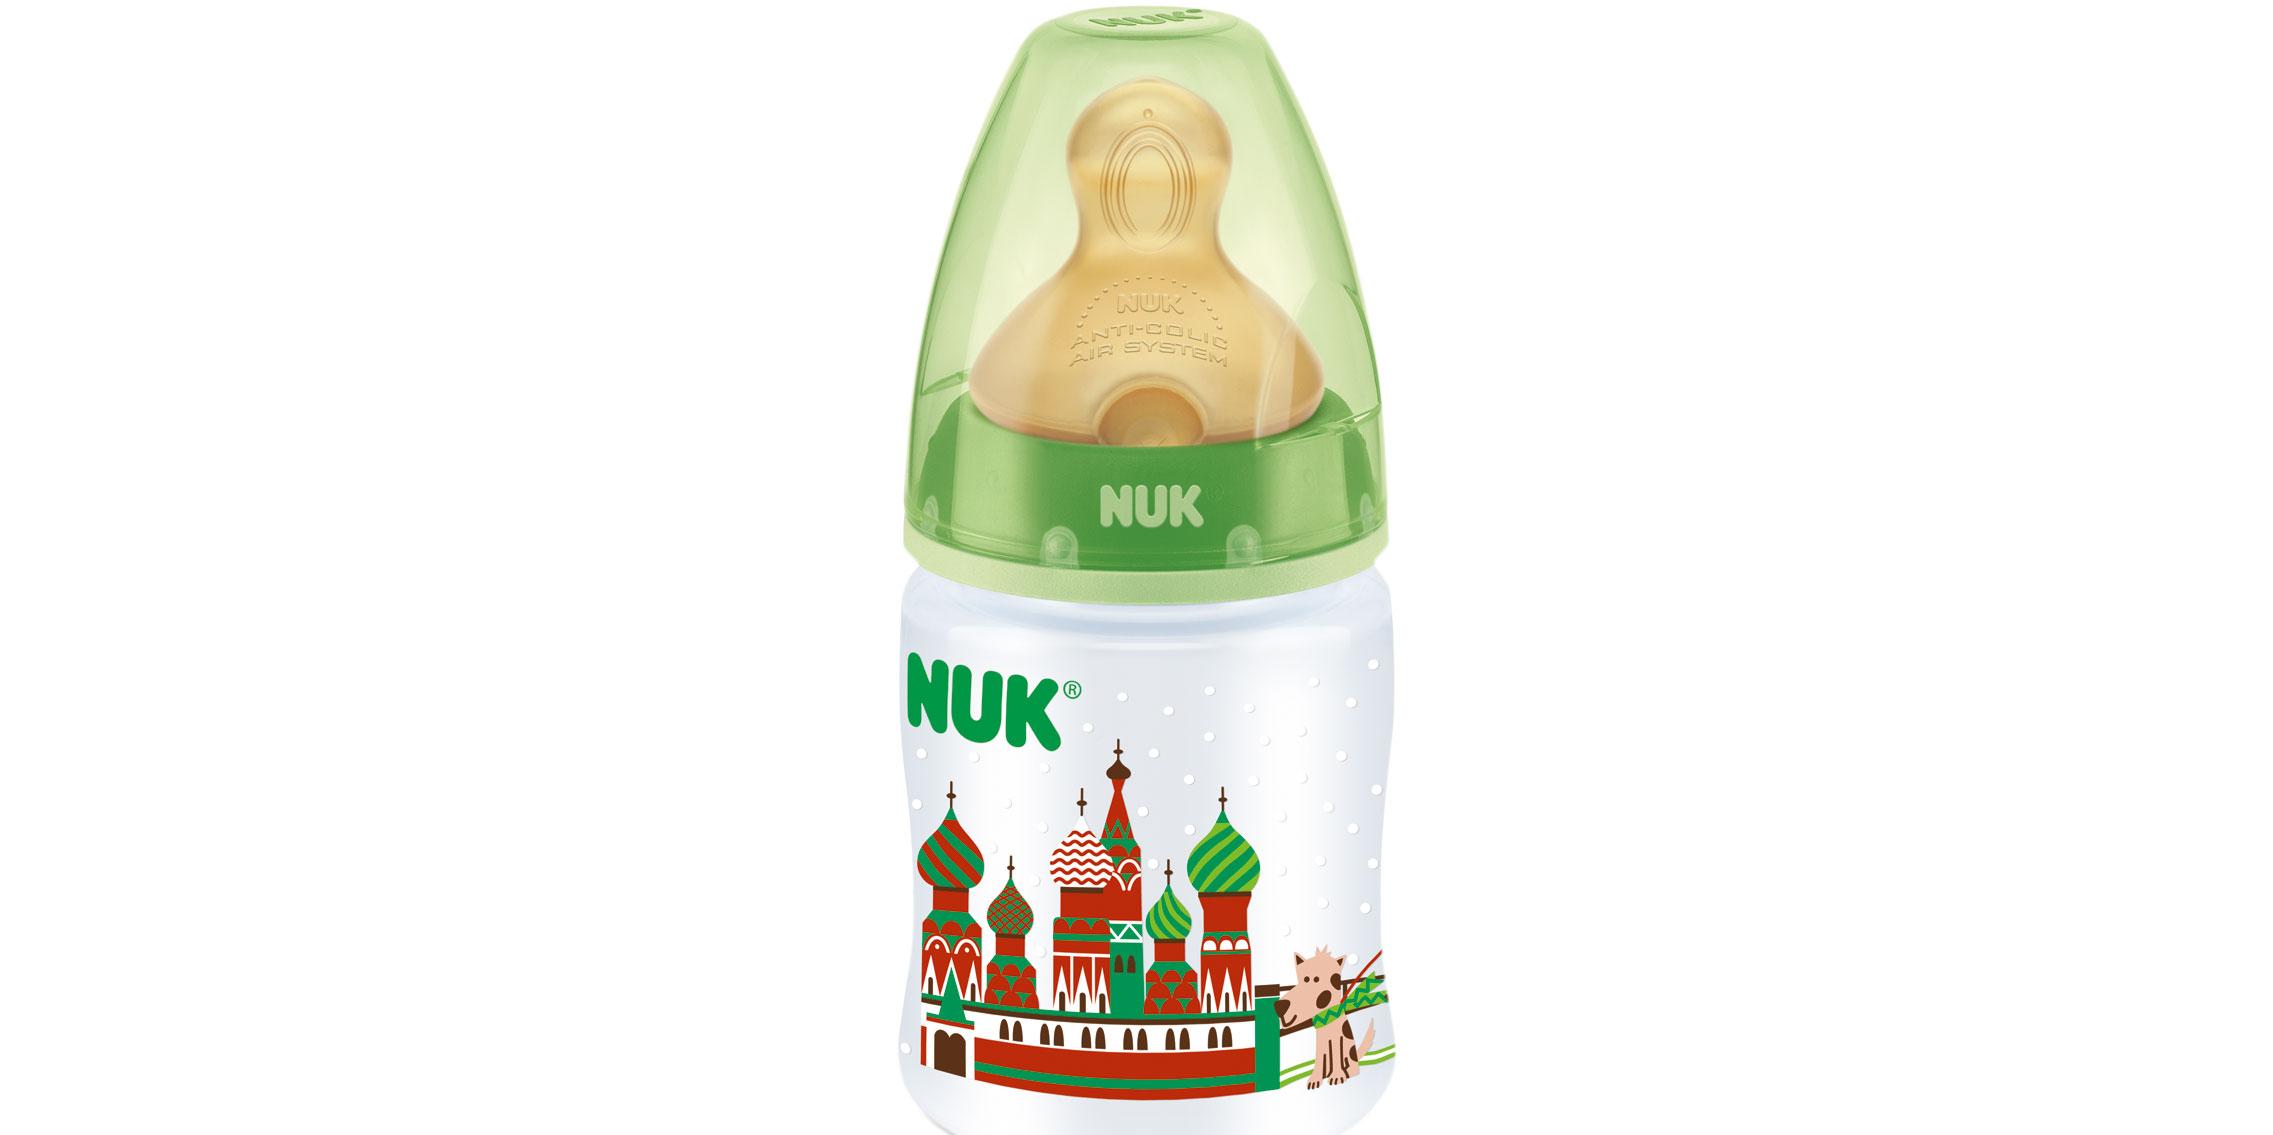 Nuk Travel